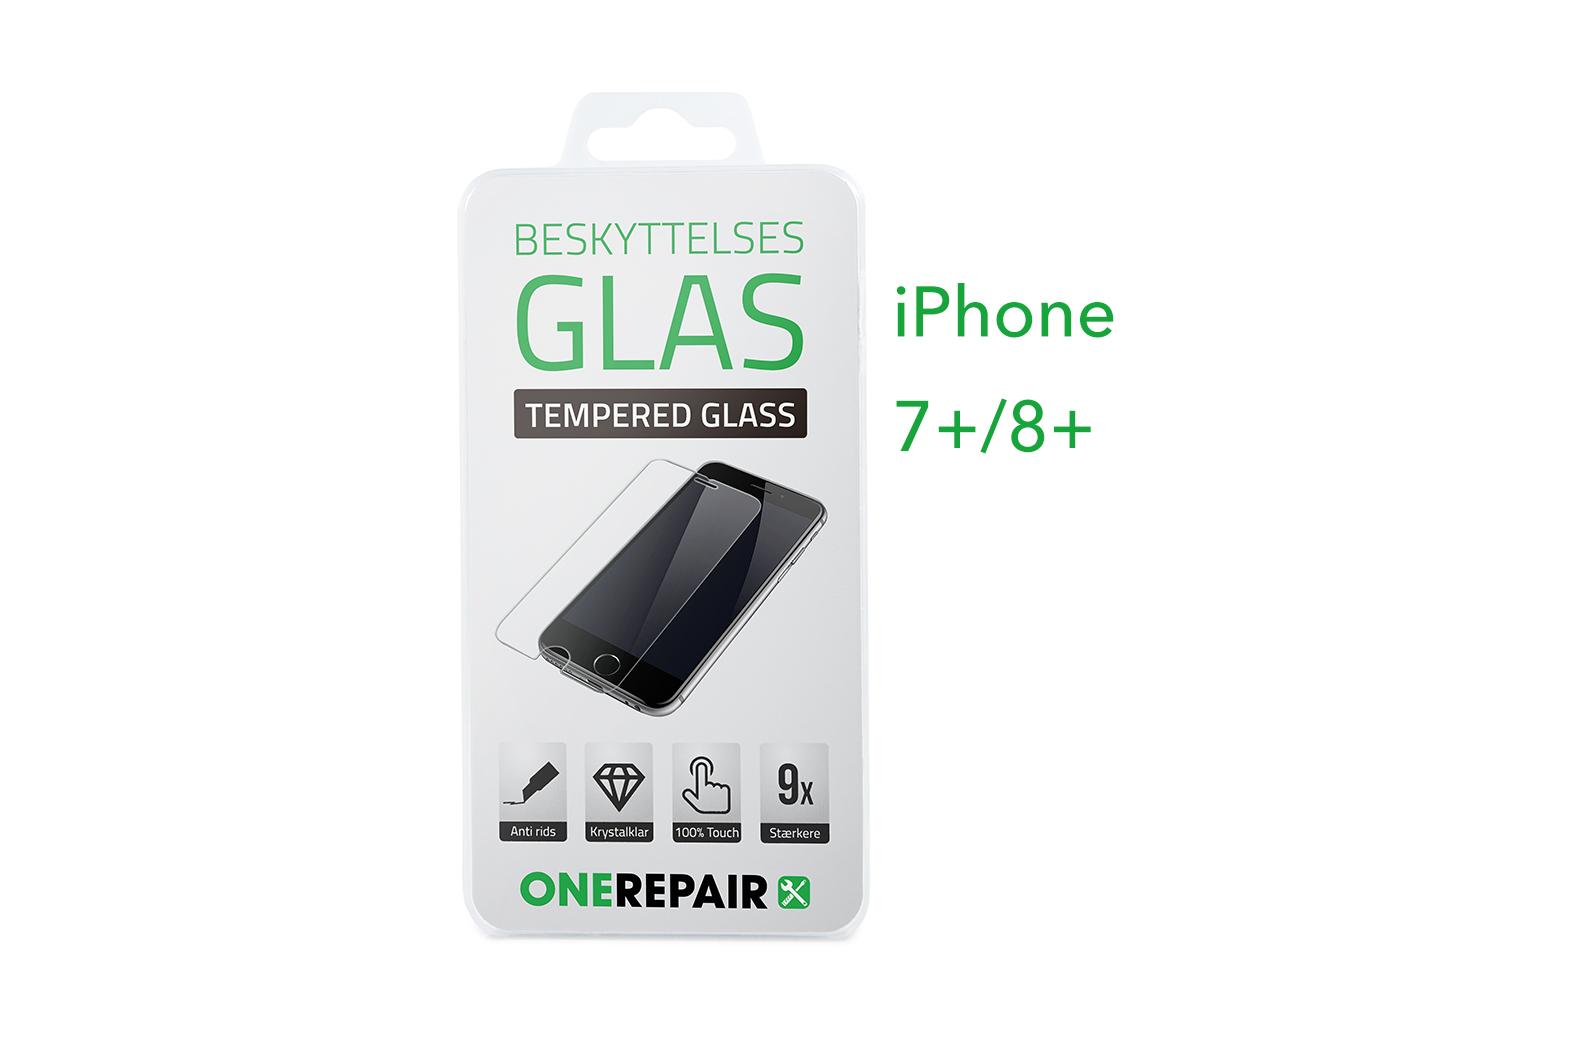 351268_iPhone_7+_8+_Plus_Beskyttelsesglas_Beskyttelses_Glas_Tempered_glass_Panserglas_Panser_Glas_Panzerglas_Panzer_OneRepair_00001